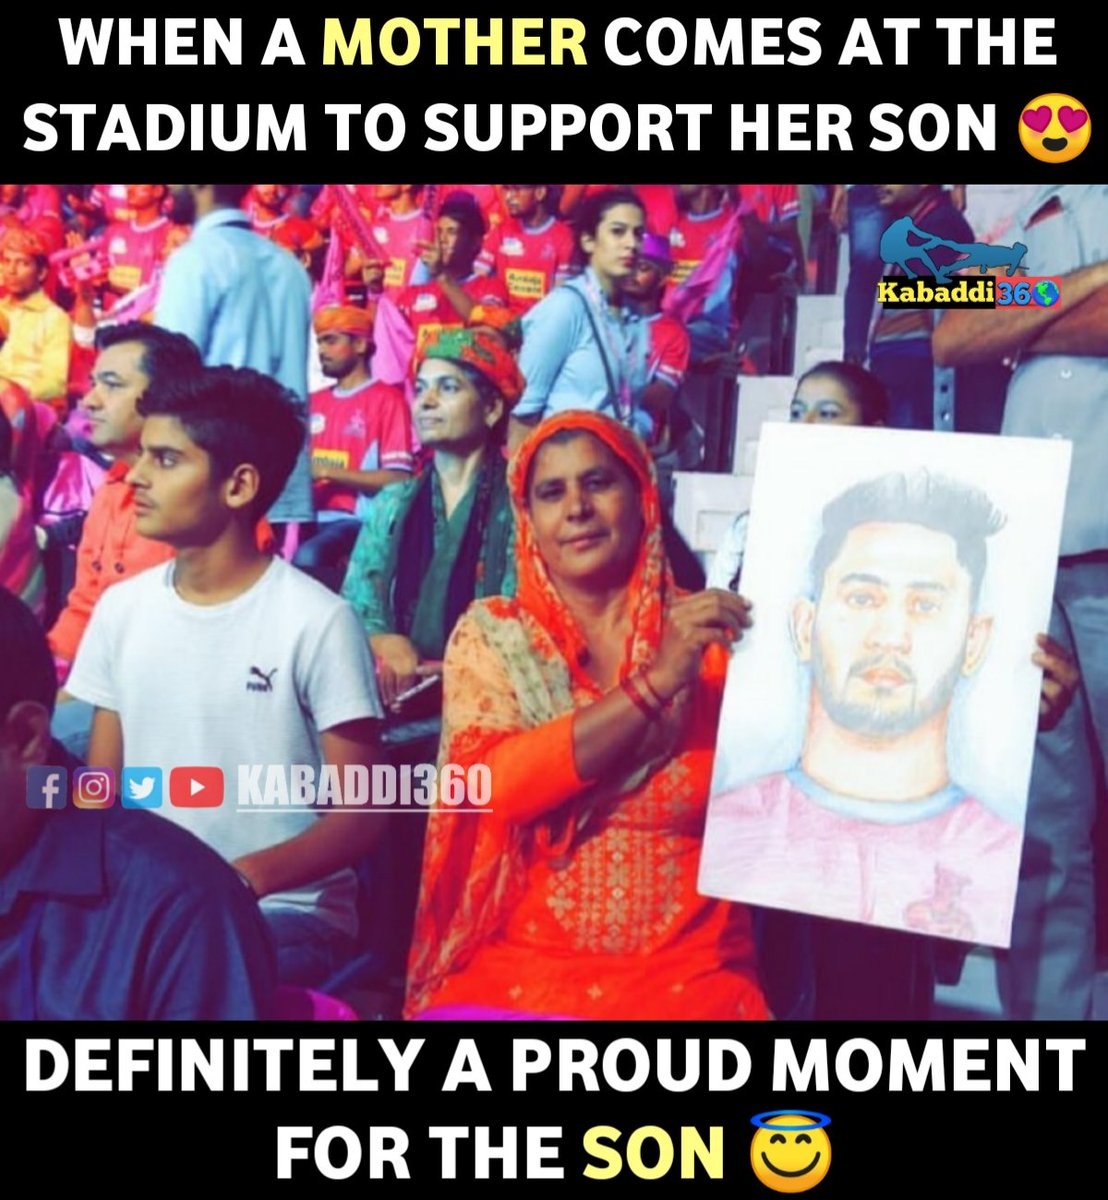 @JaipurPanthers defender Sandeep Kumar Dhull's mother spotted supporting him during Jaipur's match against Bengal Warriors.  #SandeepDhull  #motherlove #jaipurpinkpanthers  #vivoprokabaddi  #PKLwithKabaddi360